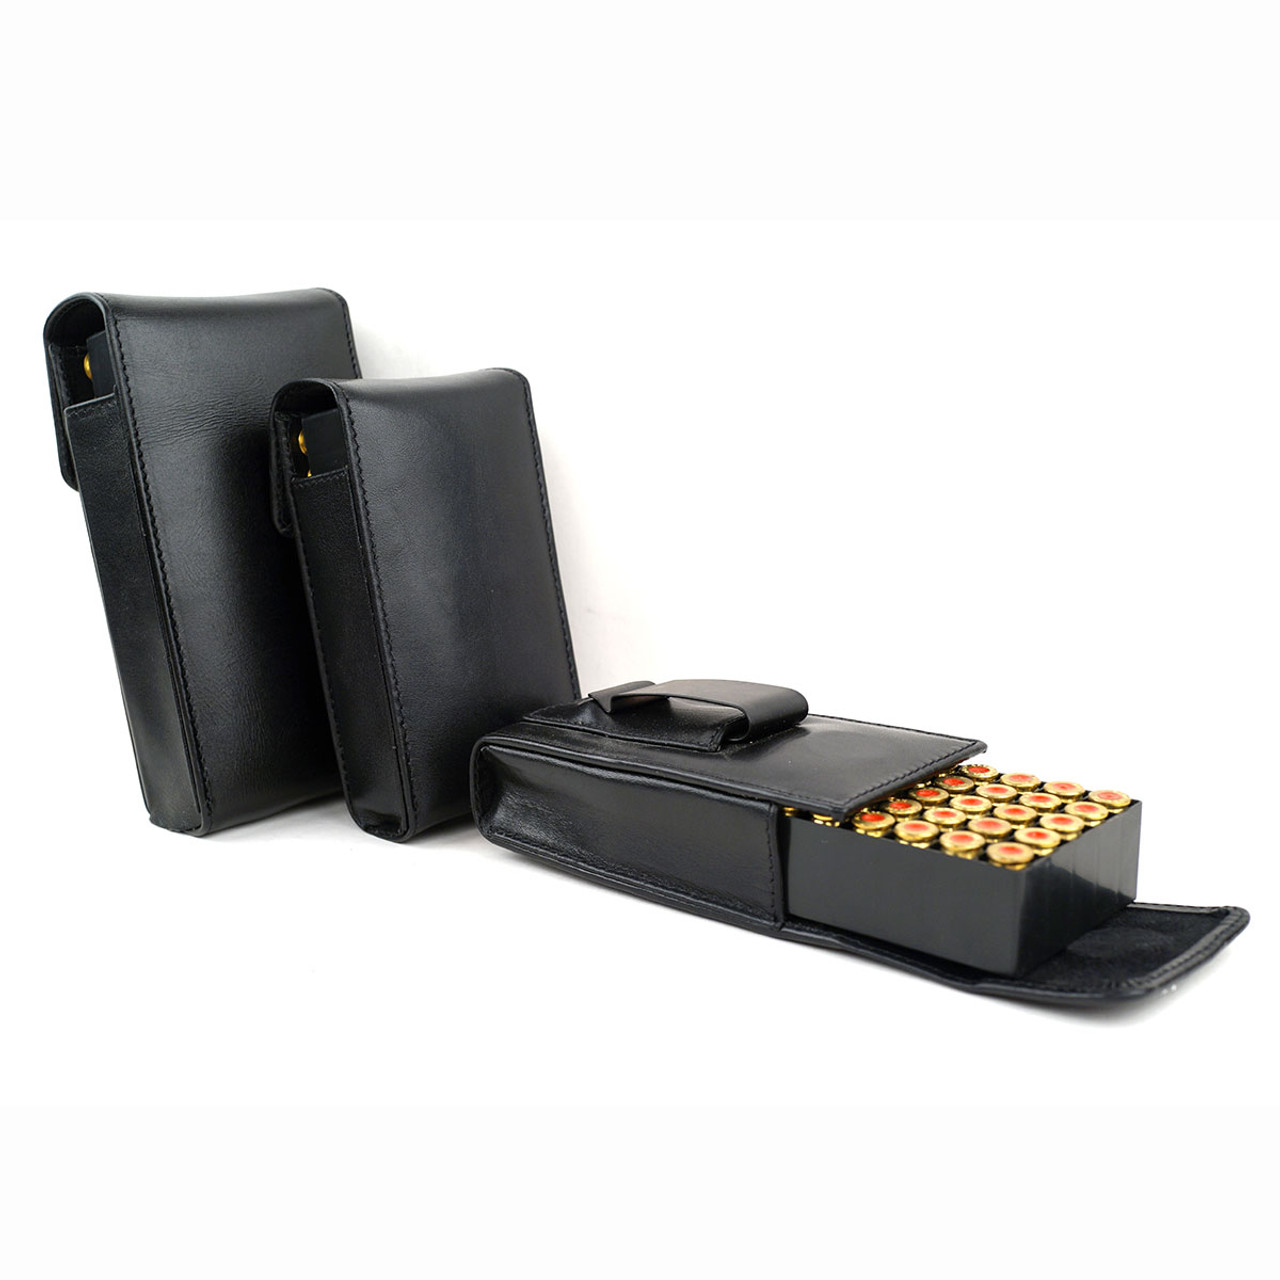 M&P Shield 9mm Leather Arsenal 50 Round Belt Case